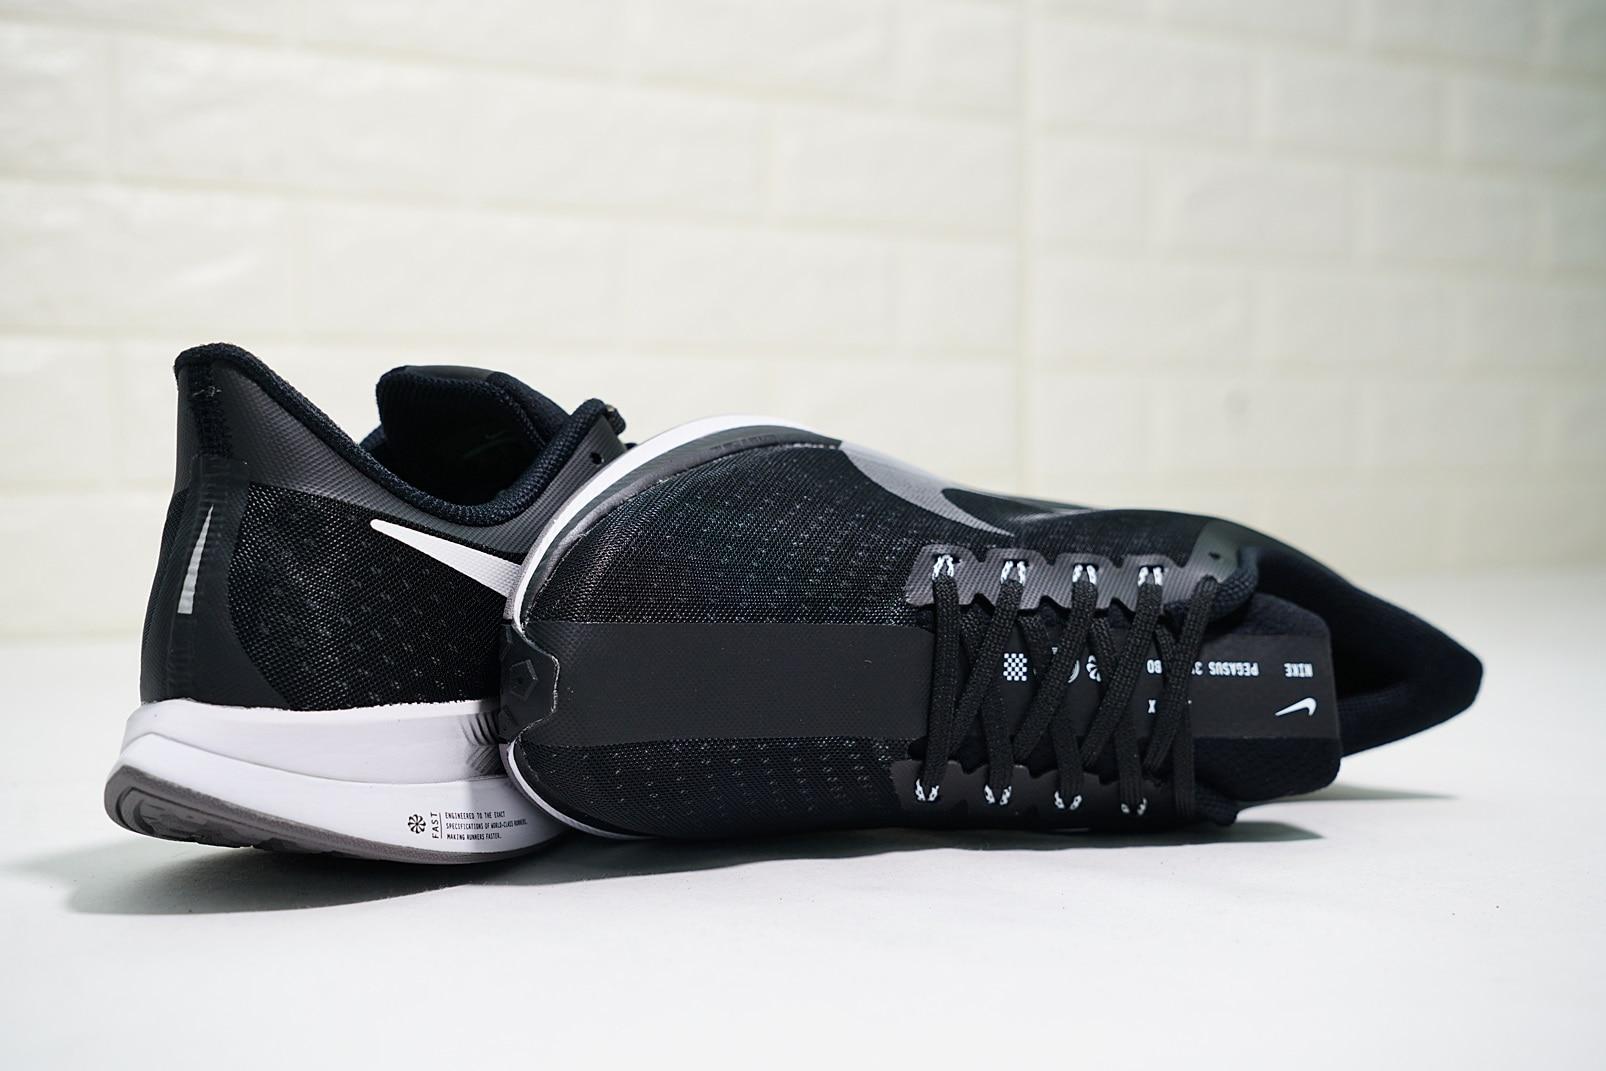 Zoom Pegasus Turbo 35 Men's Sports Shoes Outdoor Running Shoes Comfortable Original